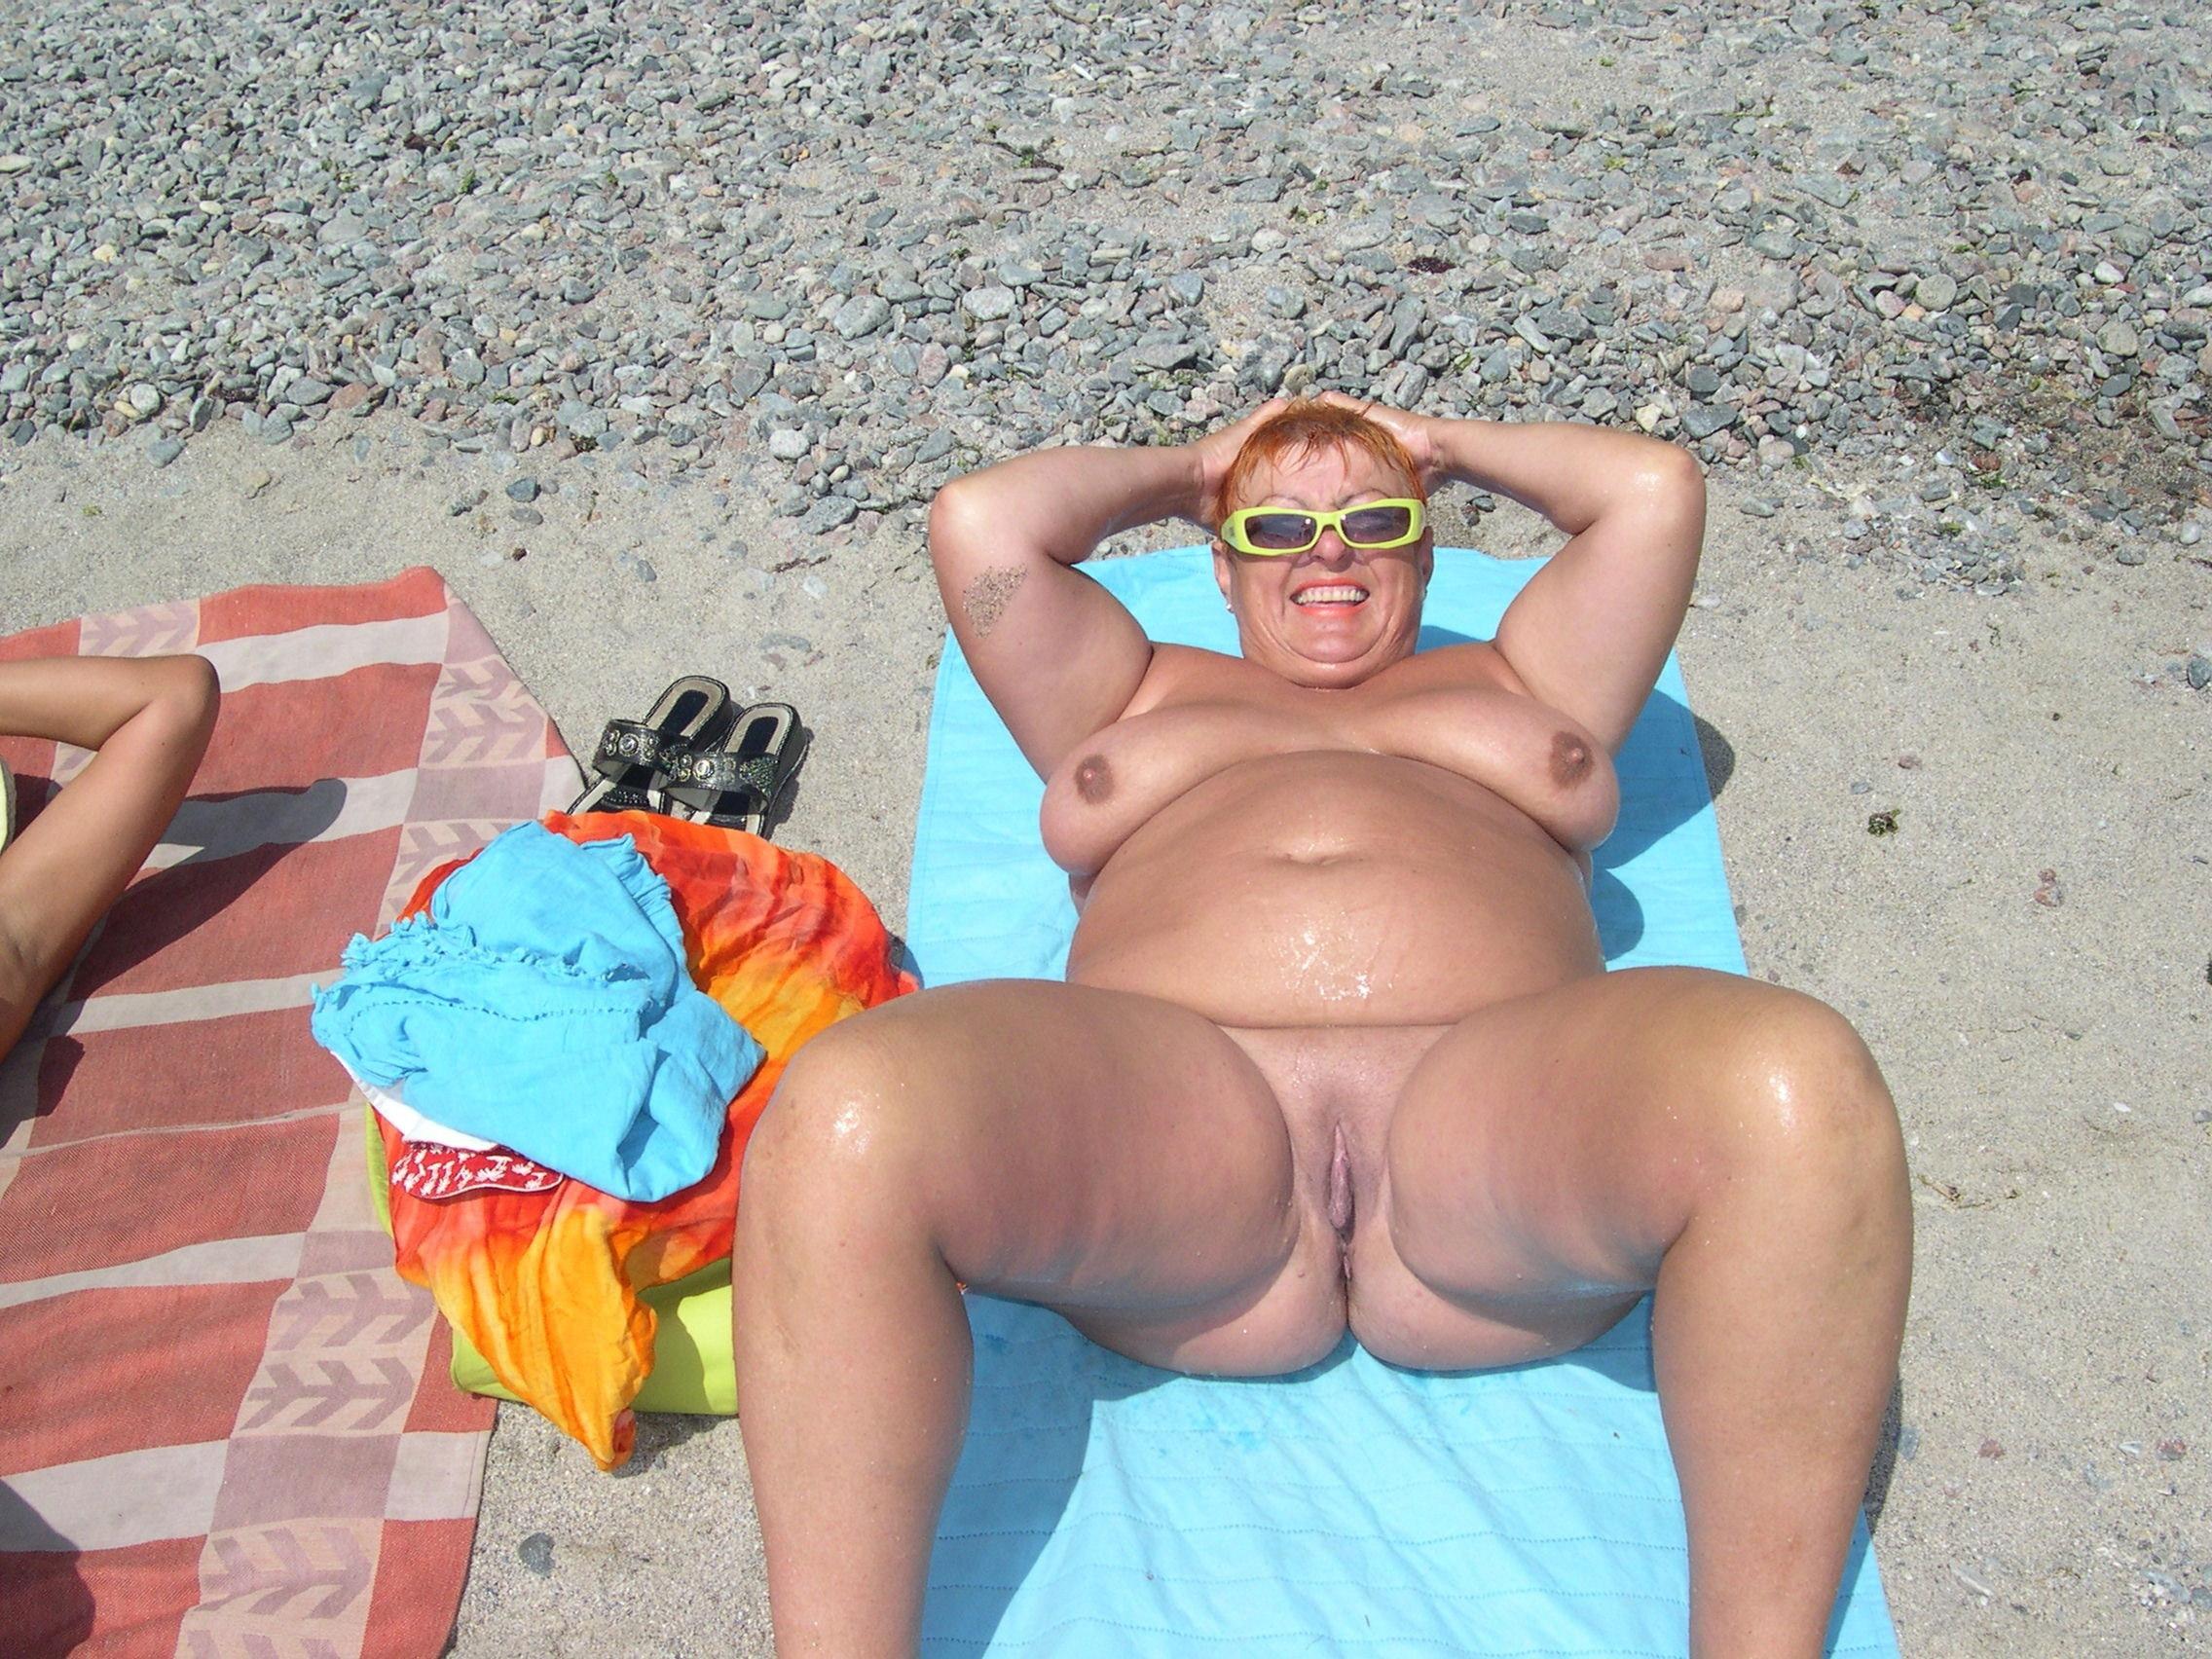 пляже толстушка голышом на